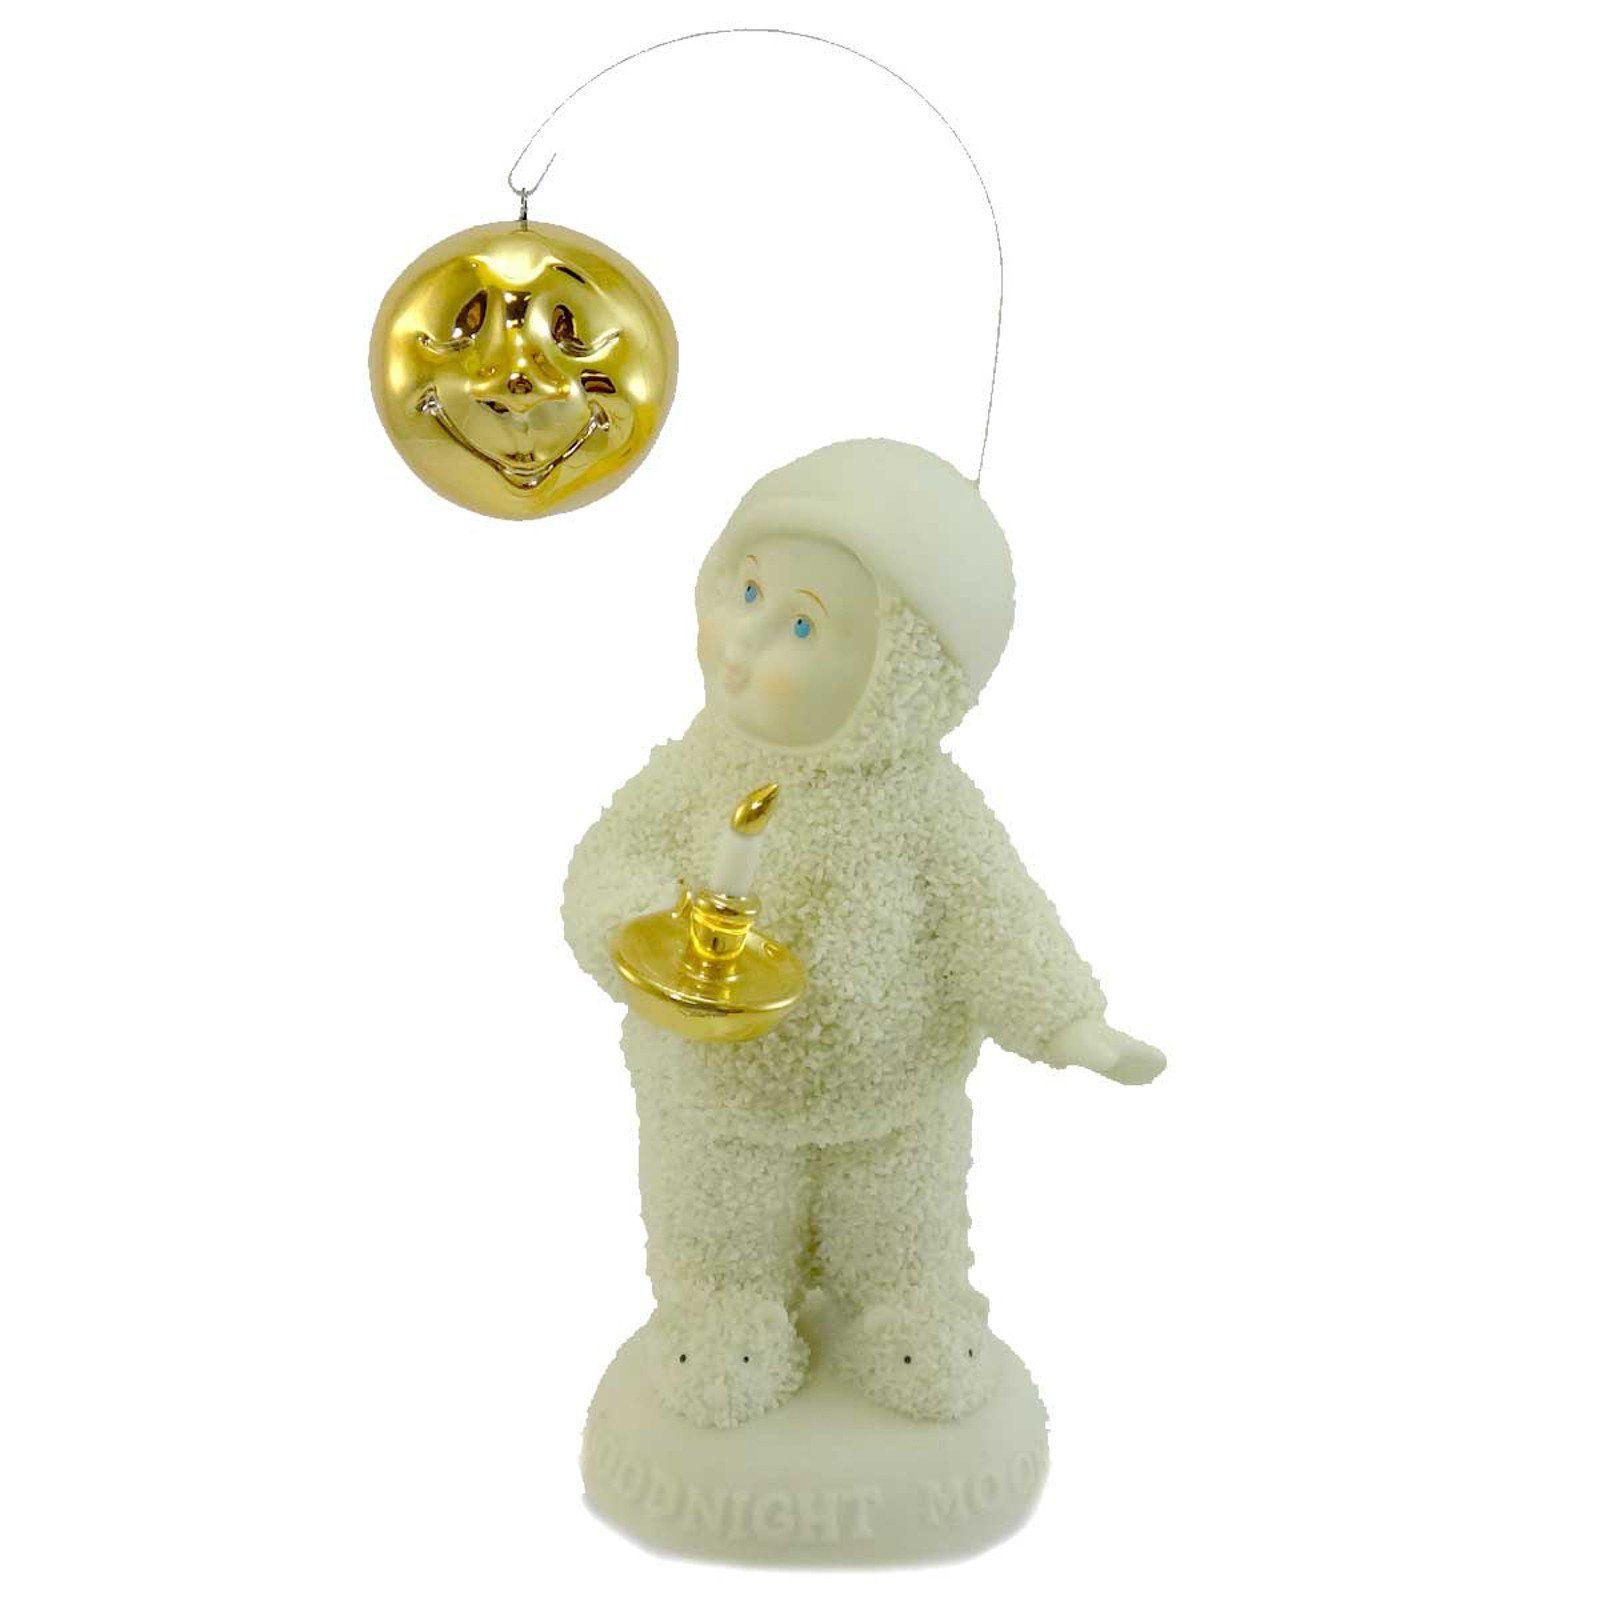 Dept 56 Snowbabies Goodnight Moon Figurine